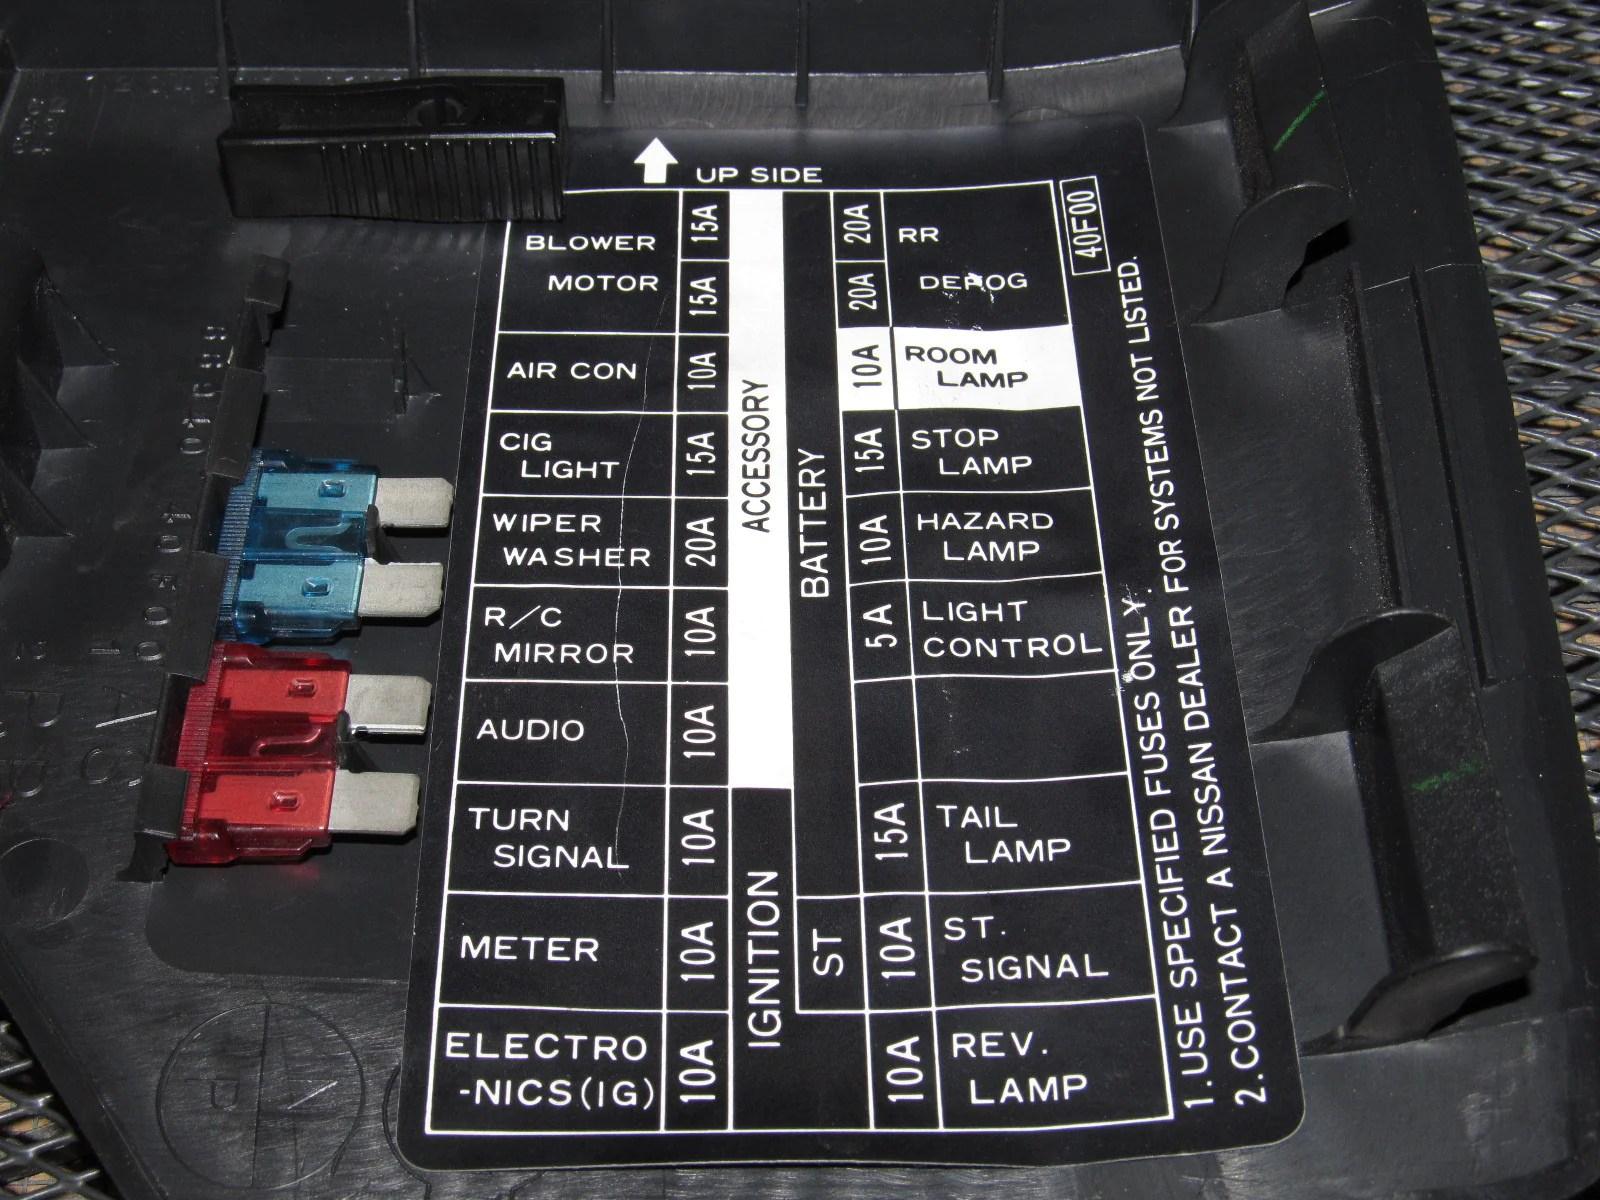 S13 Fuse Box Diagram | Wiring Schematic Diagram Nissan Bakkie Fuse Box Diagram on nissan champion 1400, nissan 1 tonner, nissan 1400 car, nissan champ 1400 custom,